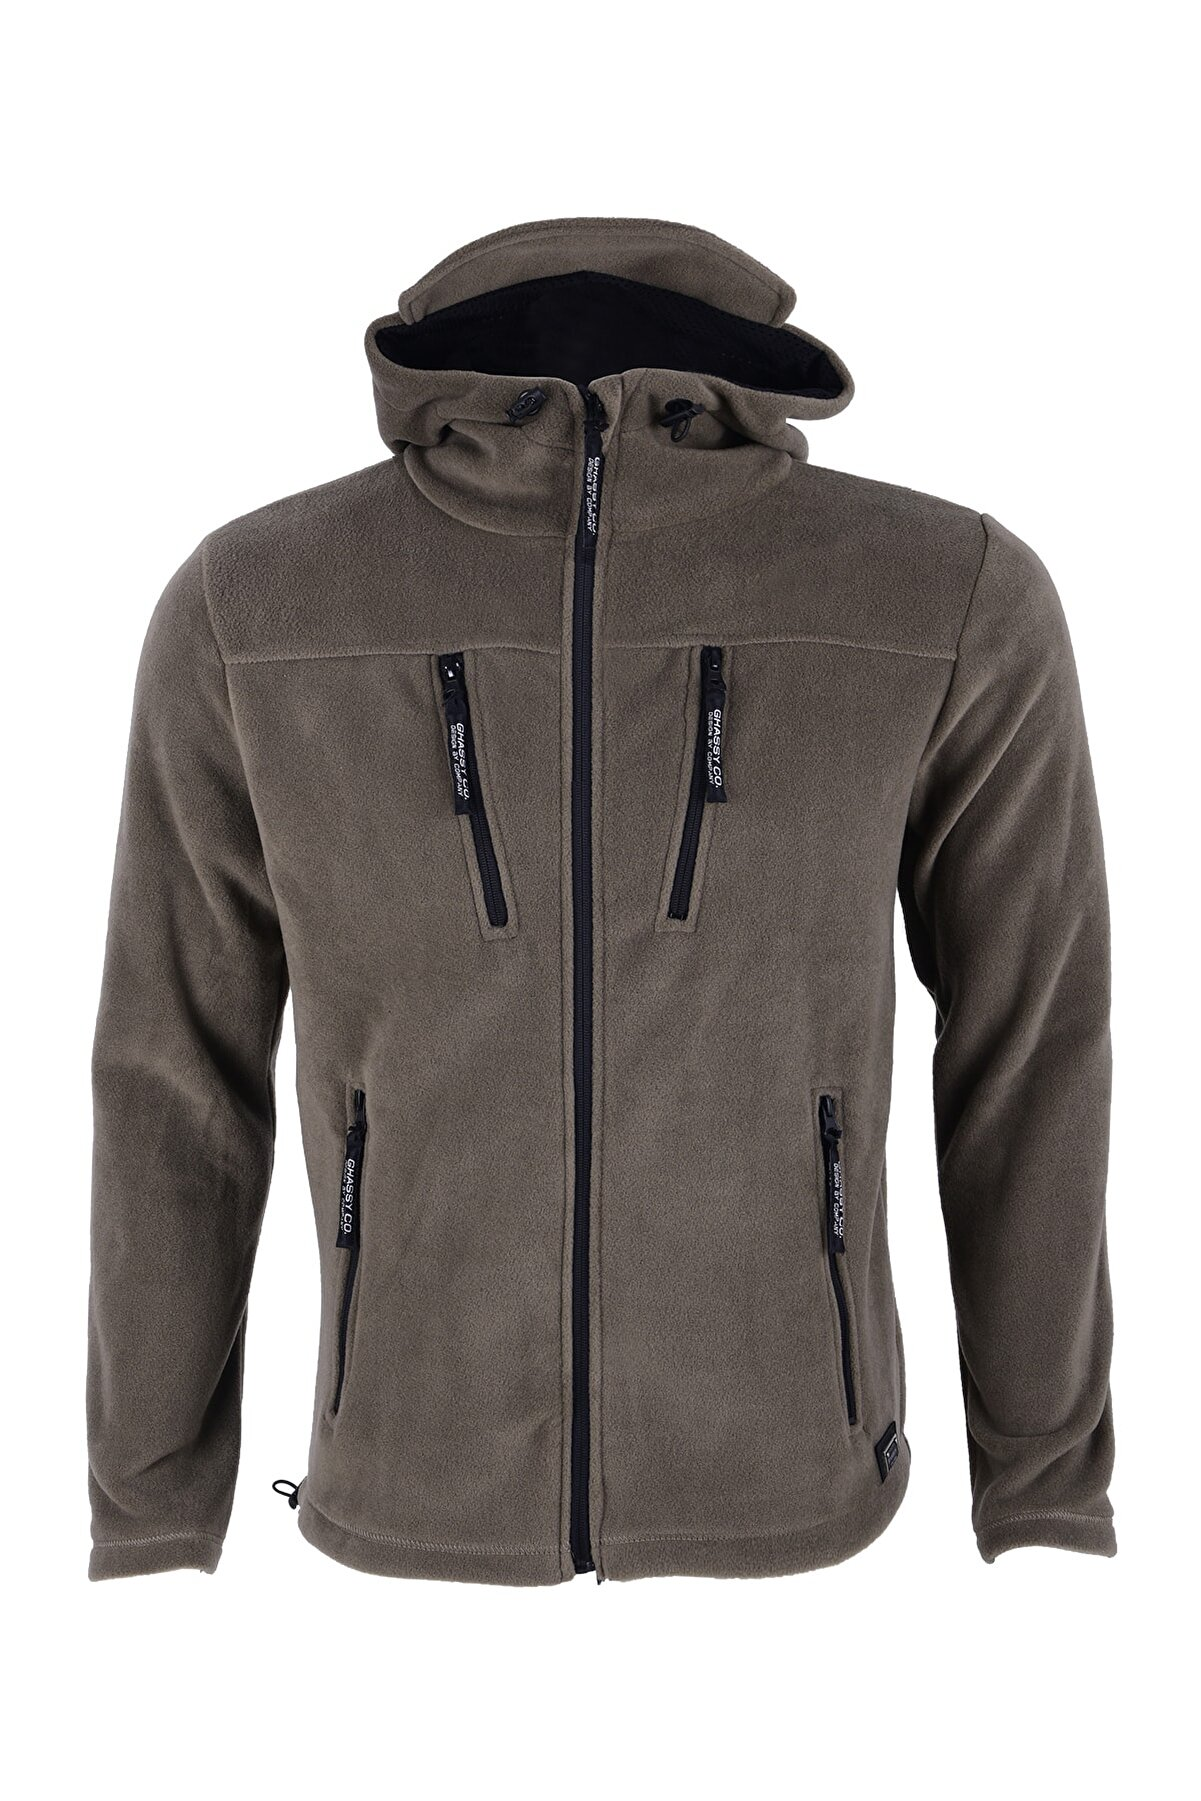 Ghassy Co Erkek Haki Army Tactical  Polar Kapüşonlu Ceket